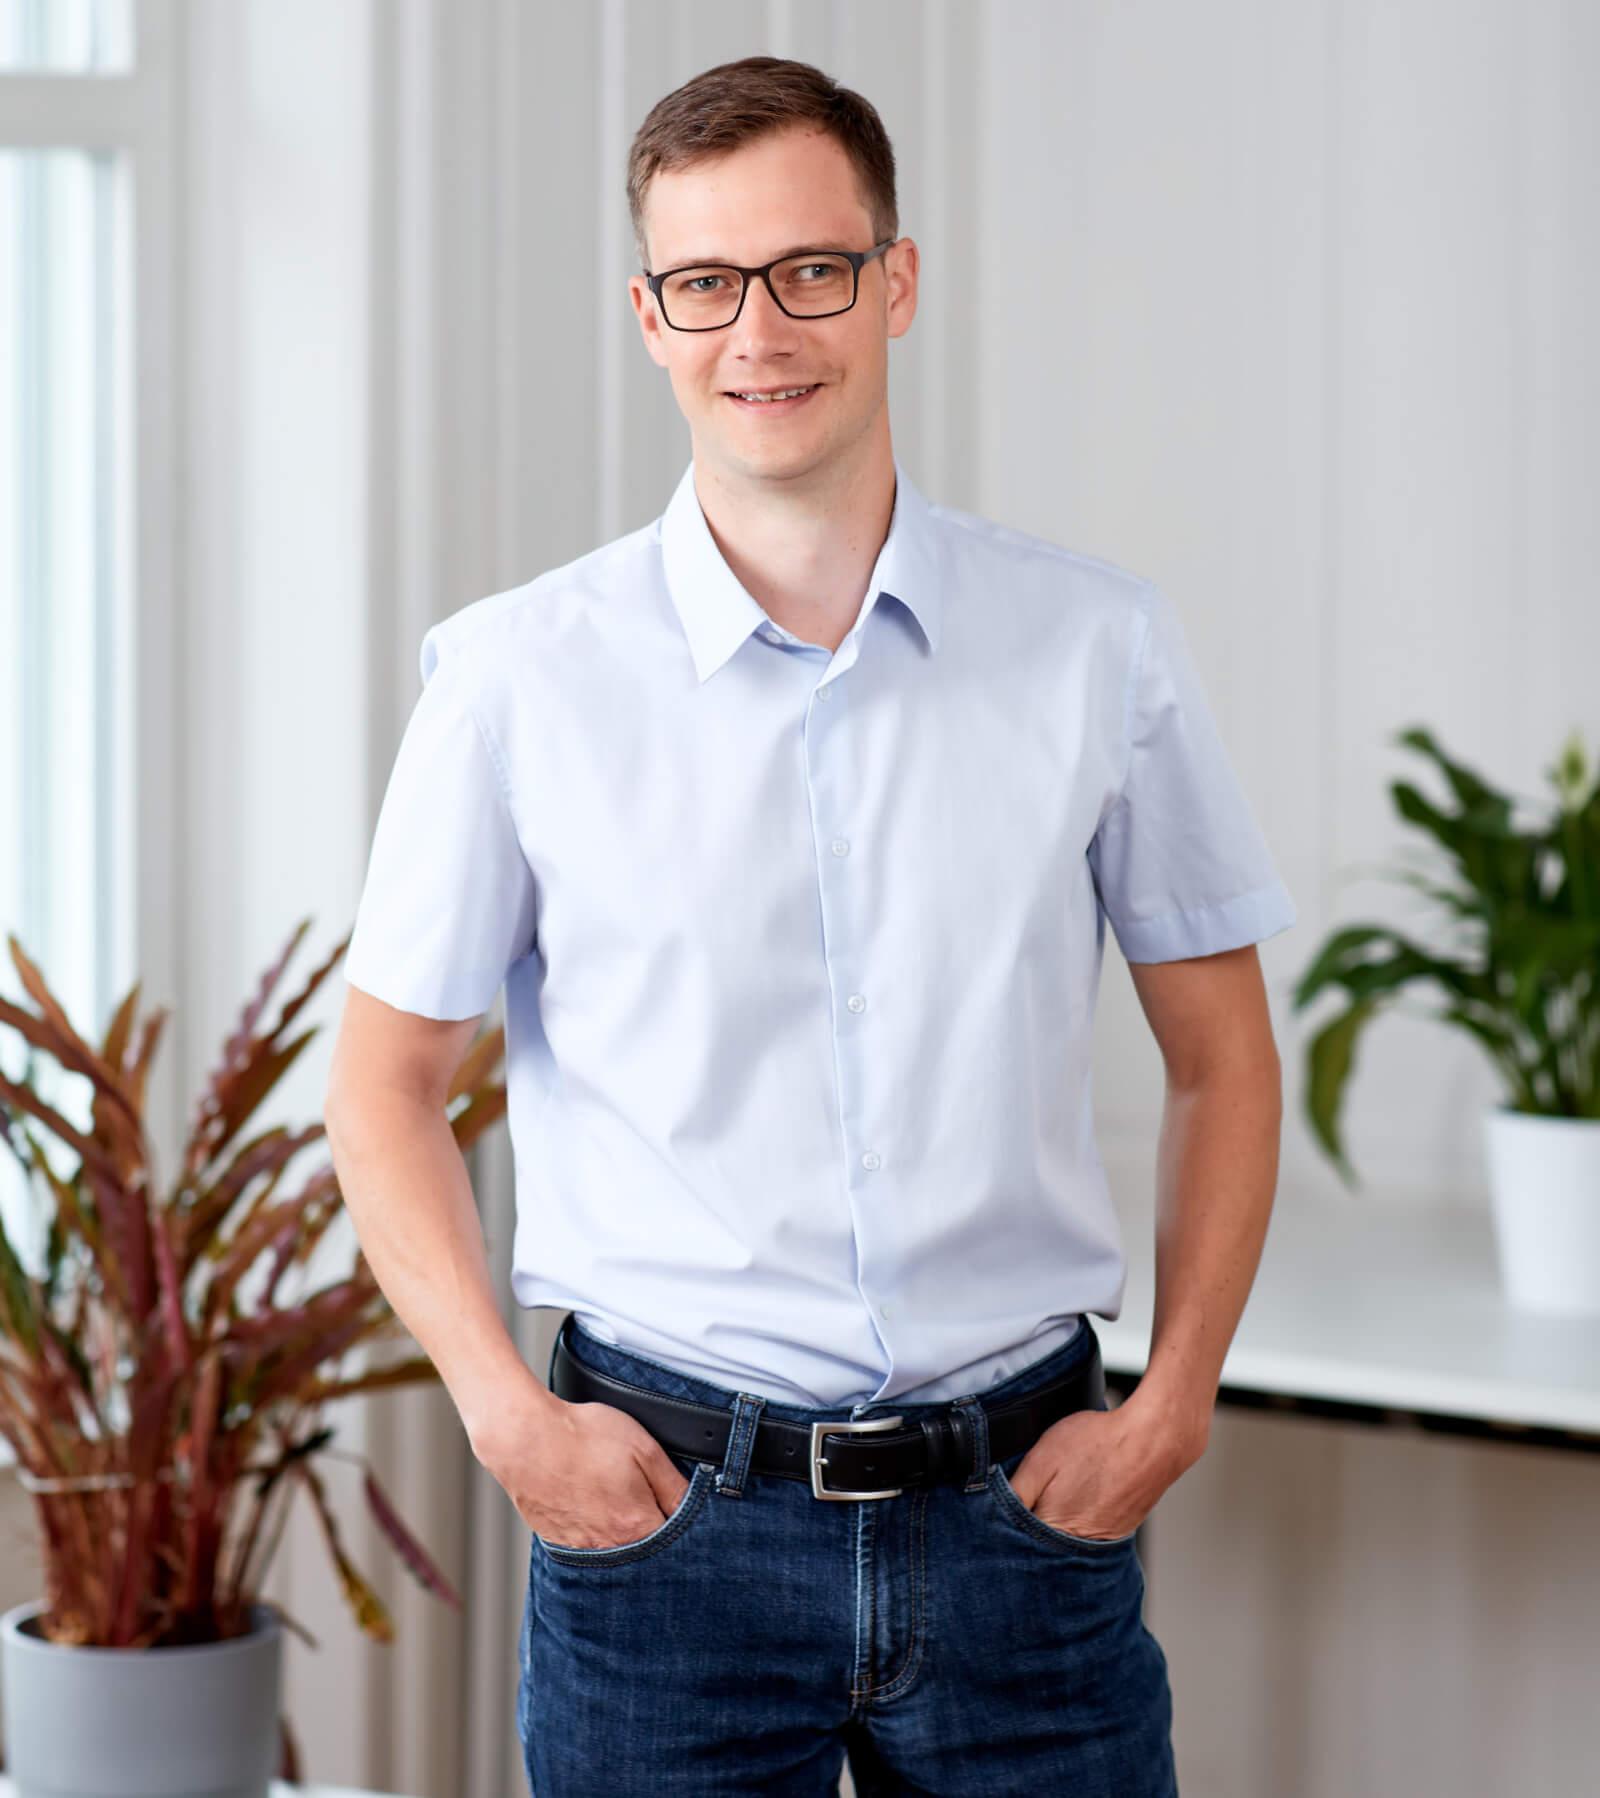 Michael Näf